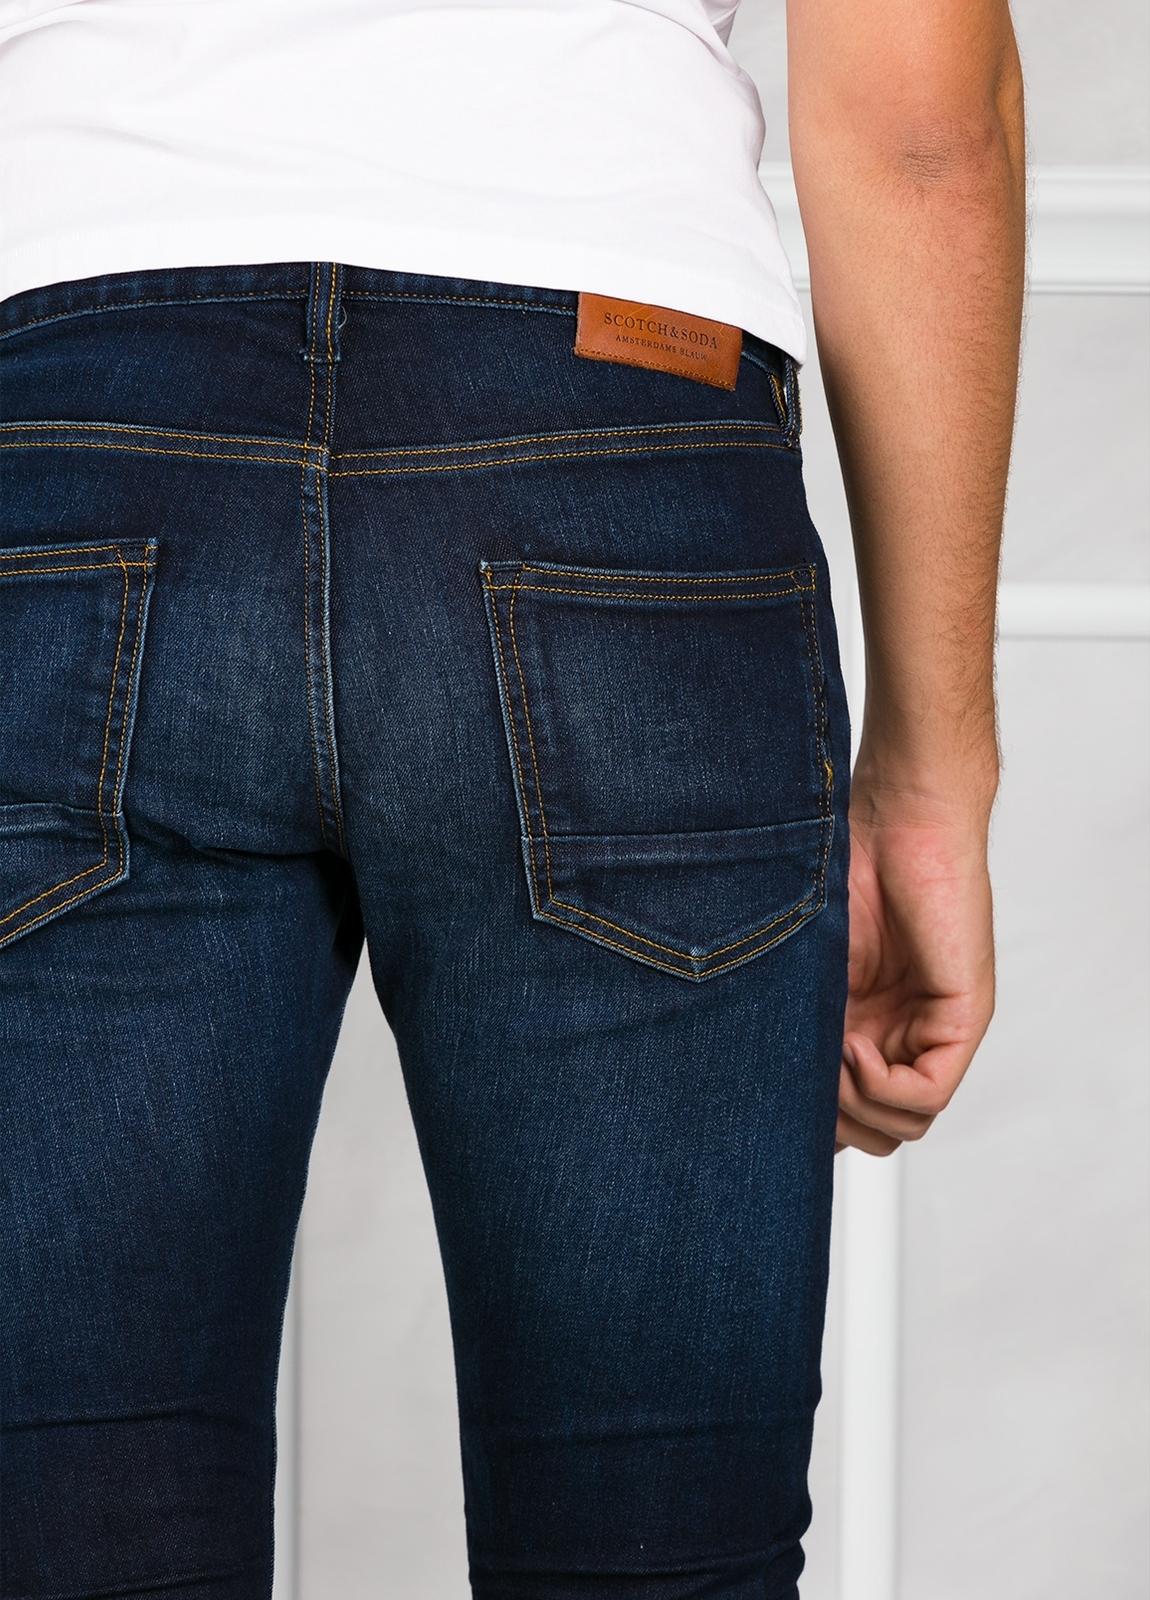 Pantalón tejano regular slim fit modelo RALSTON denim elástico color azul oscuro. 98% Algodón 2% Elastano. - Ítem2